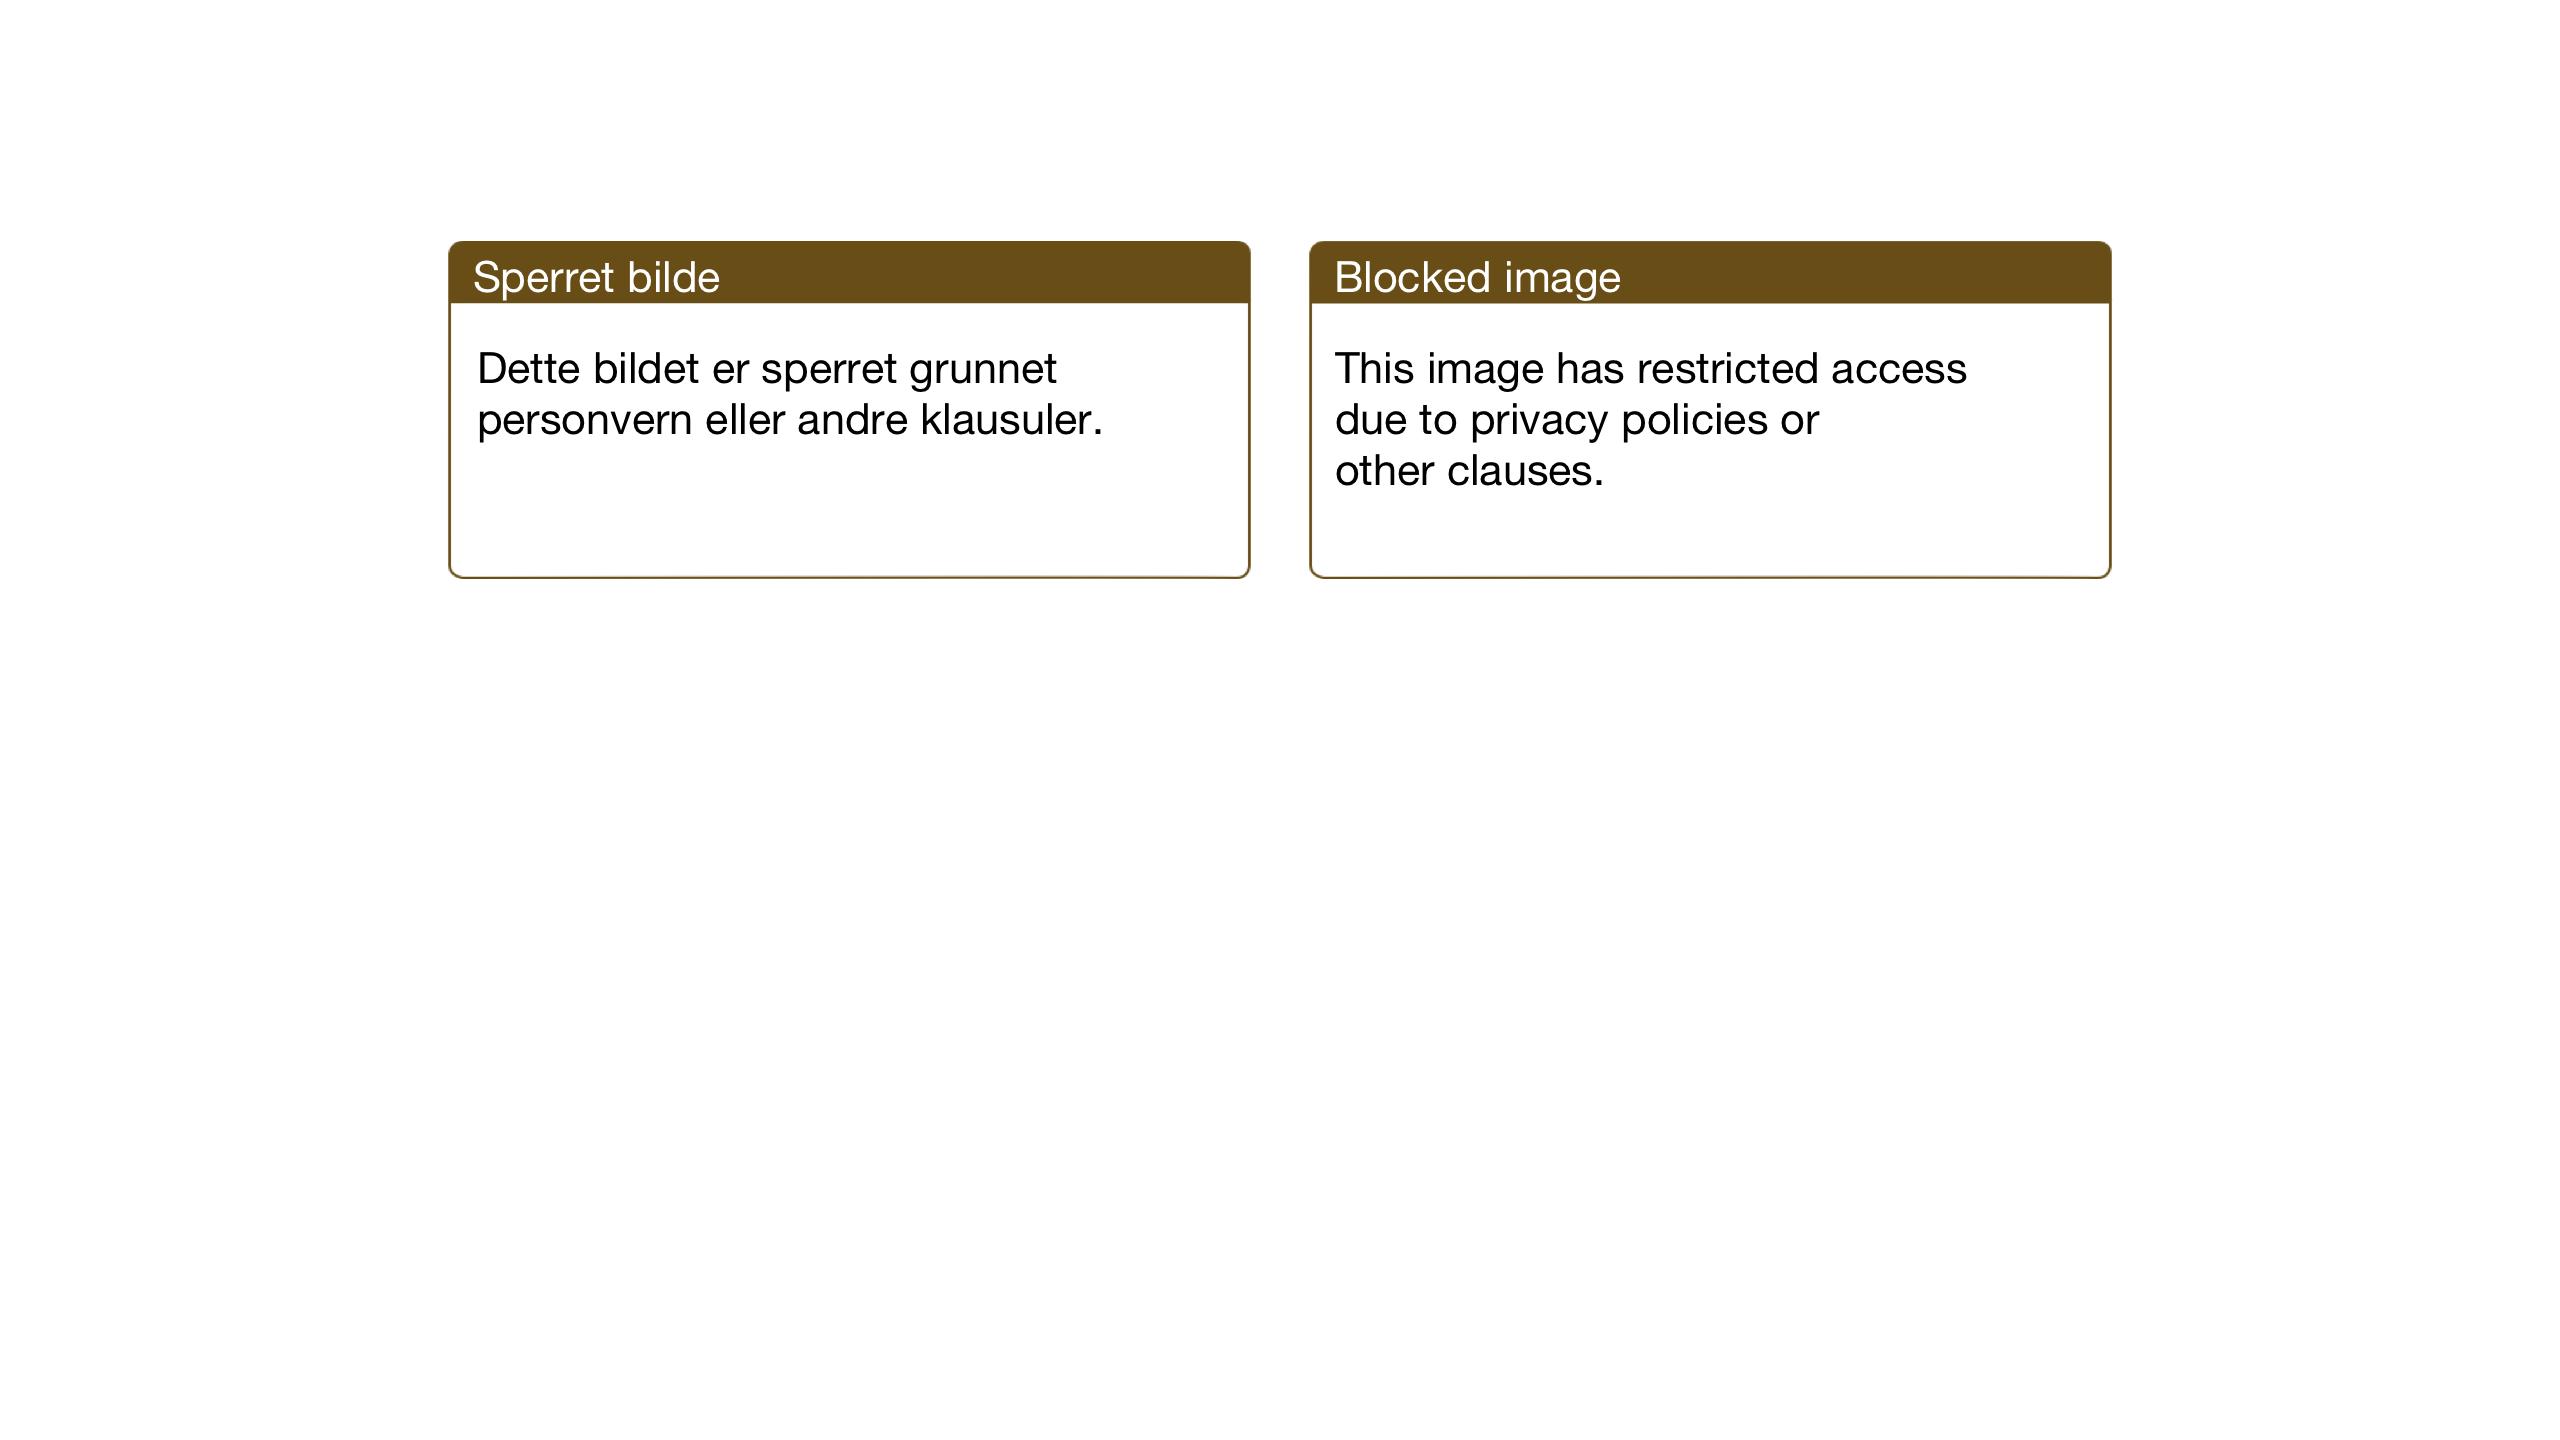 SAH, Vardal prestekontor, H/Ha/Haa/L0018: Ministerialbok nr. 18, 1930-1945, s. 30